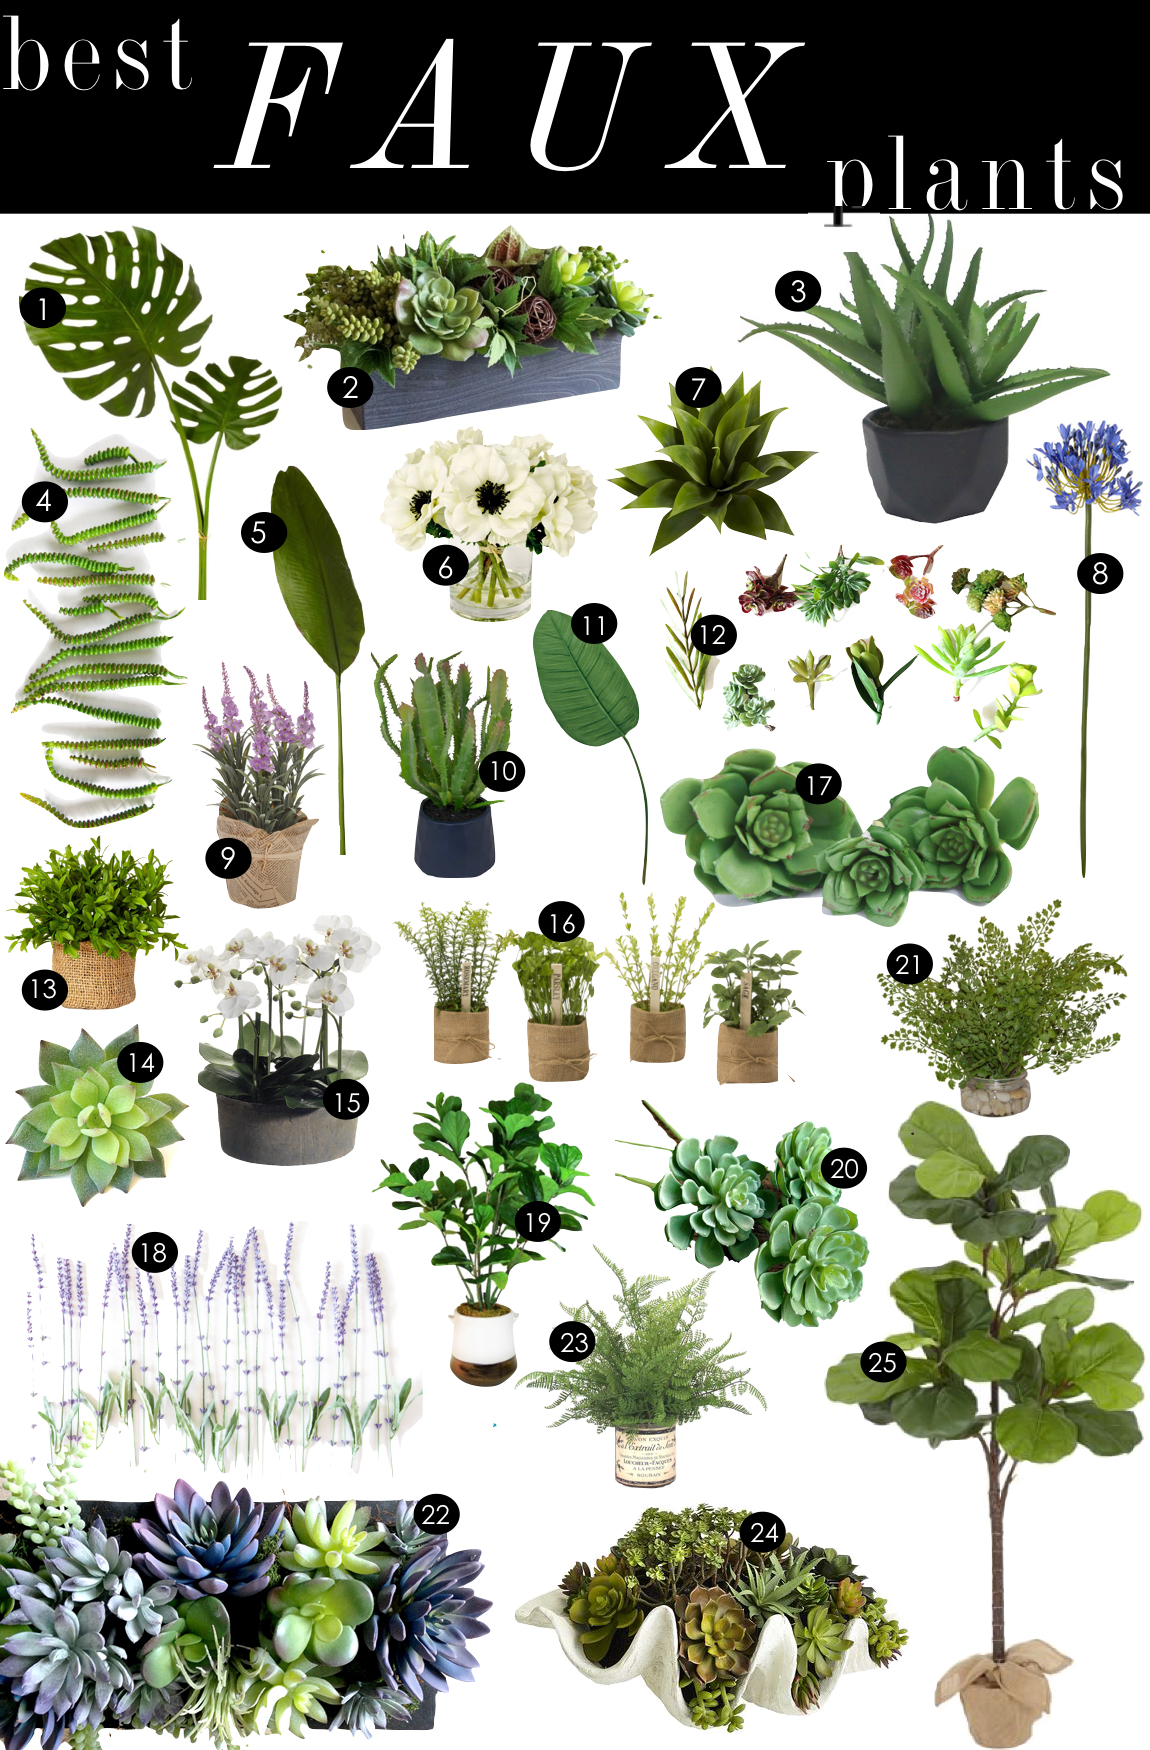 Best Faux Plants  |  Kiki's List